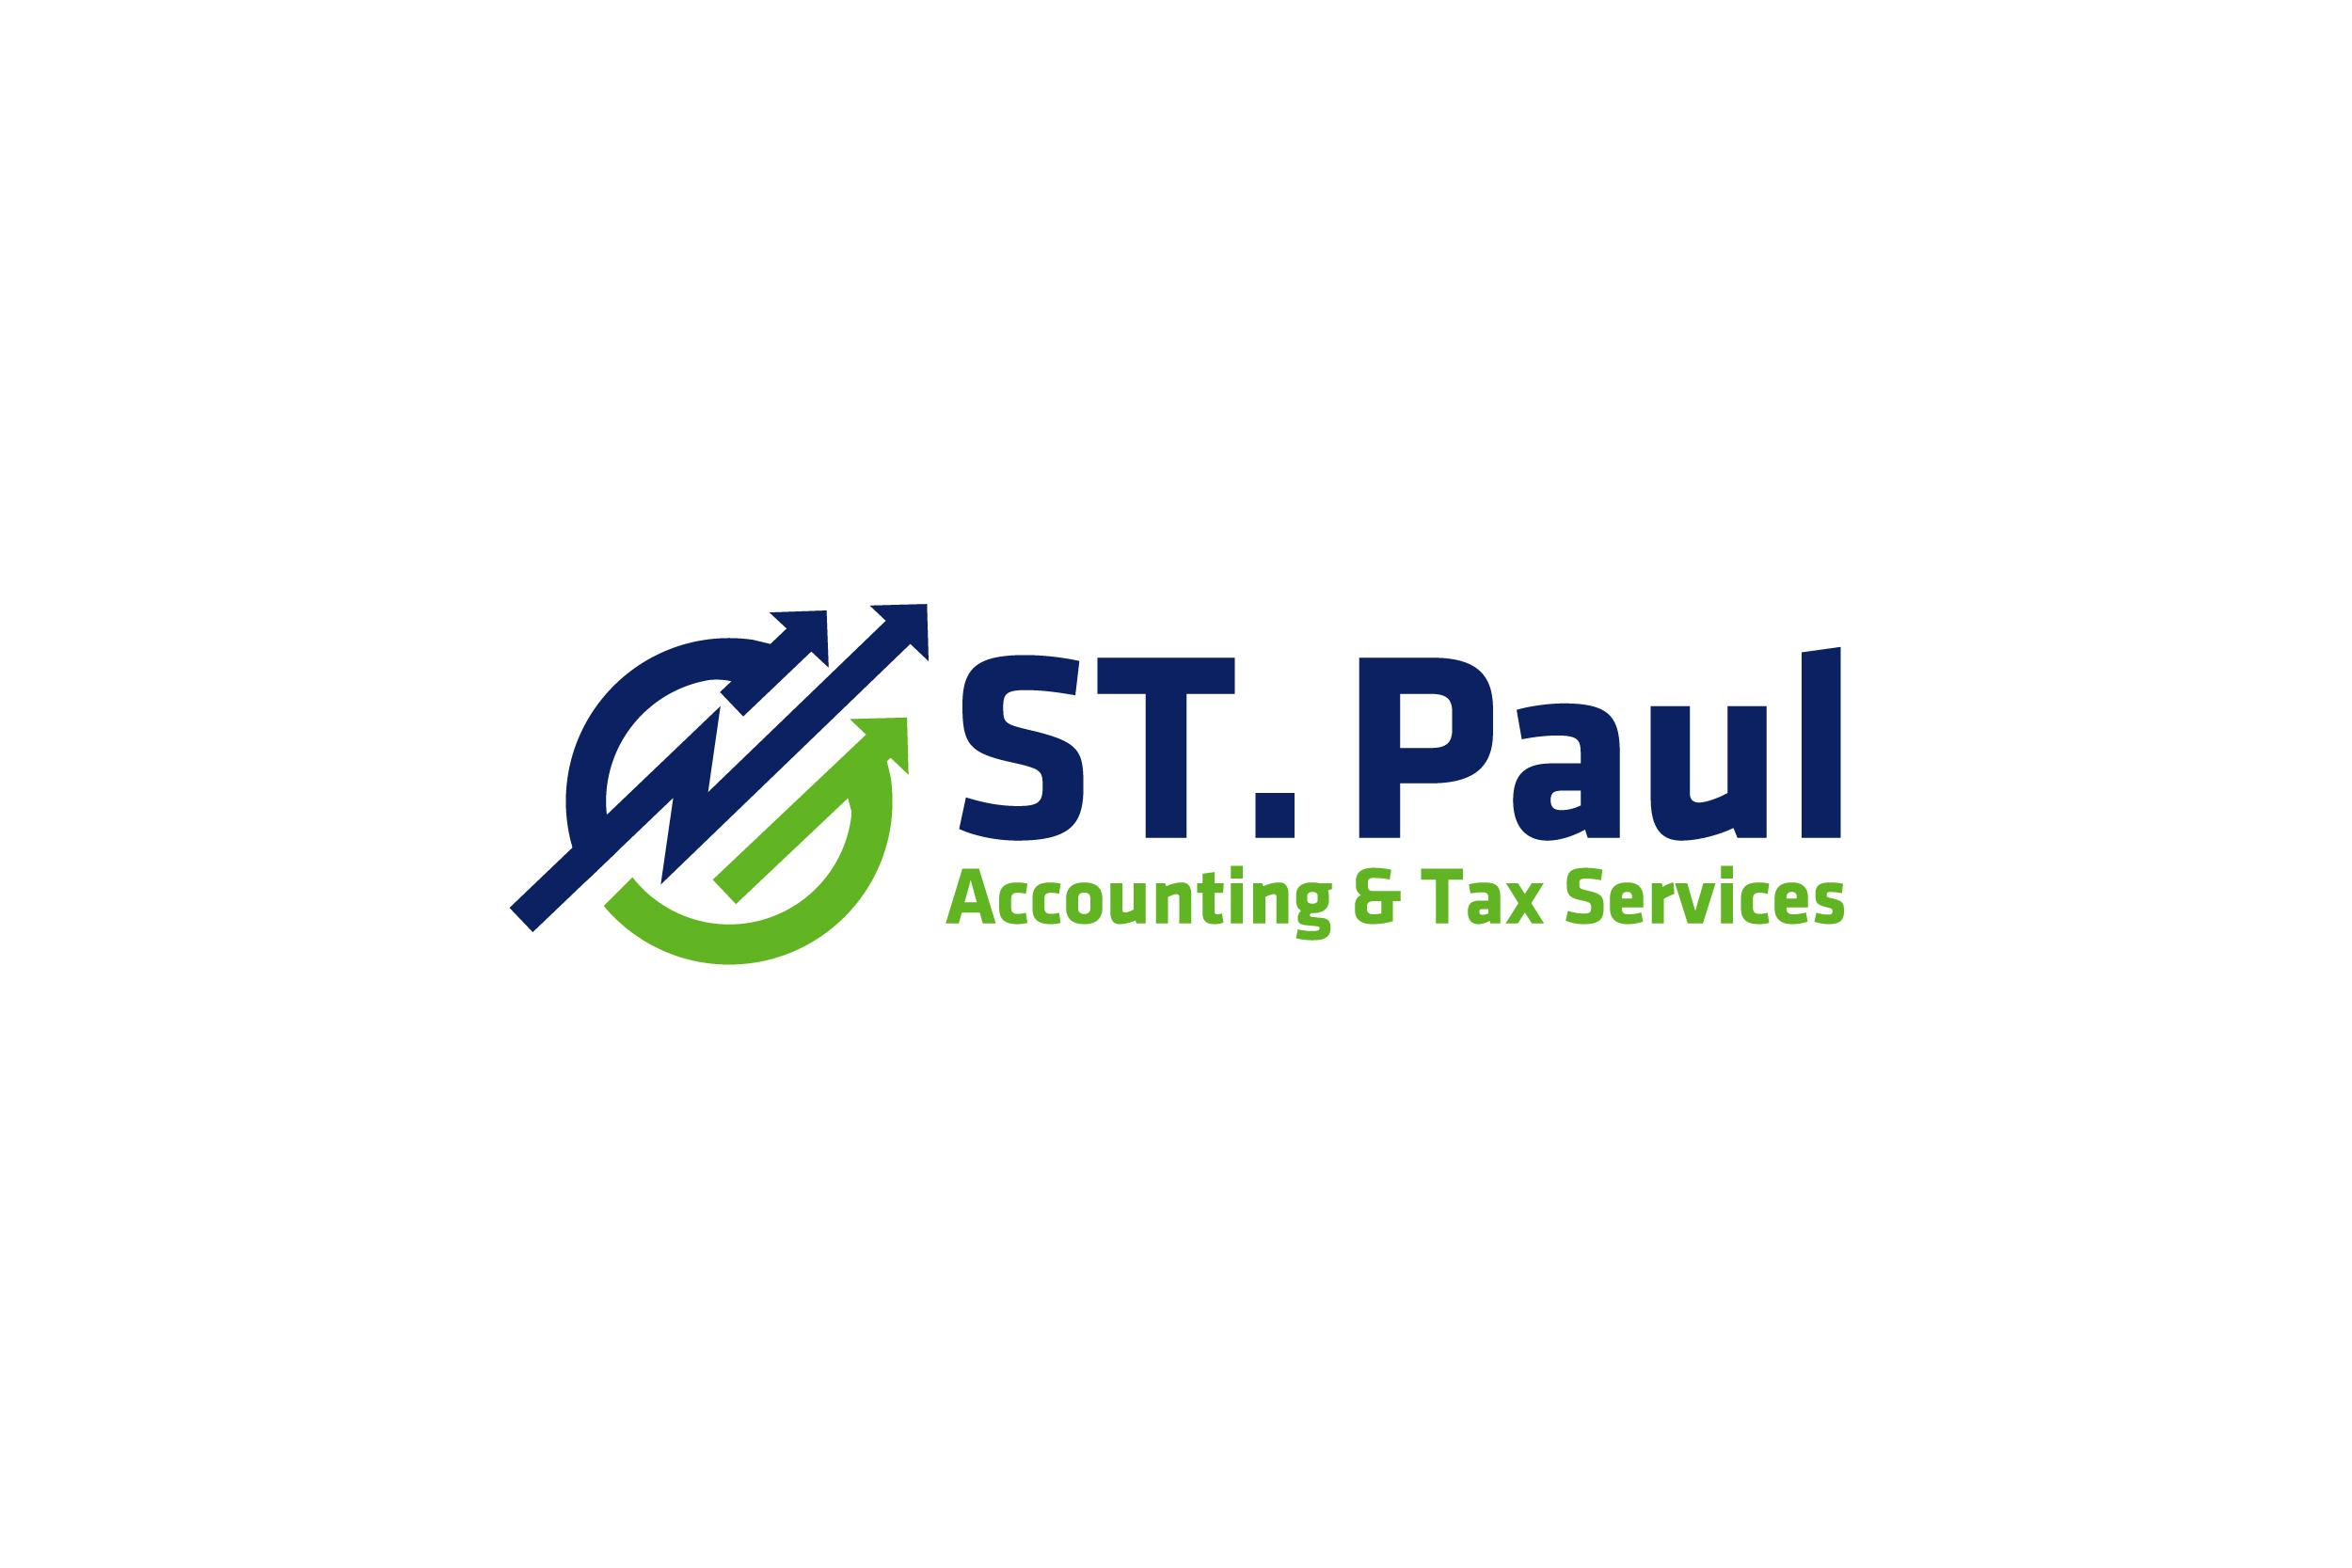 ST Paul Accounting & Tax Services L.L.C